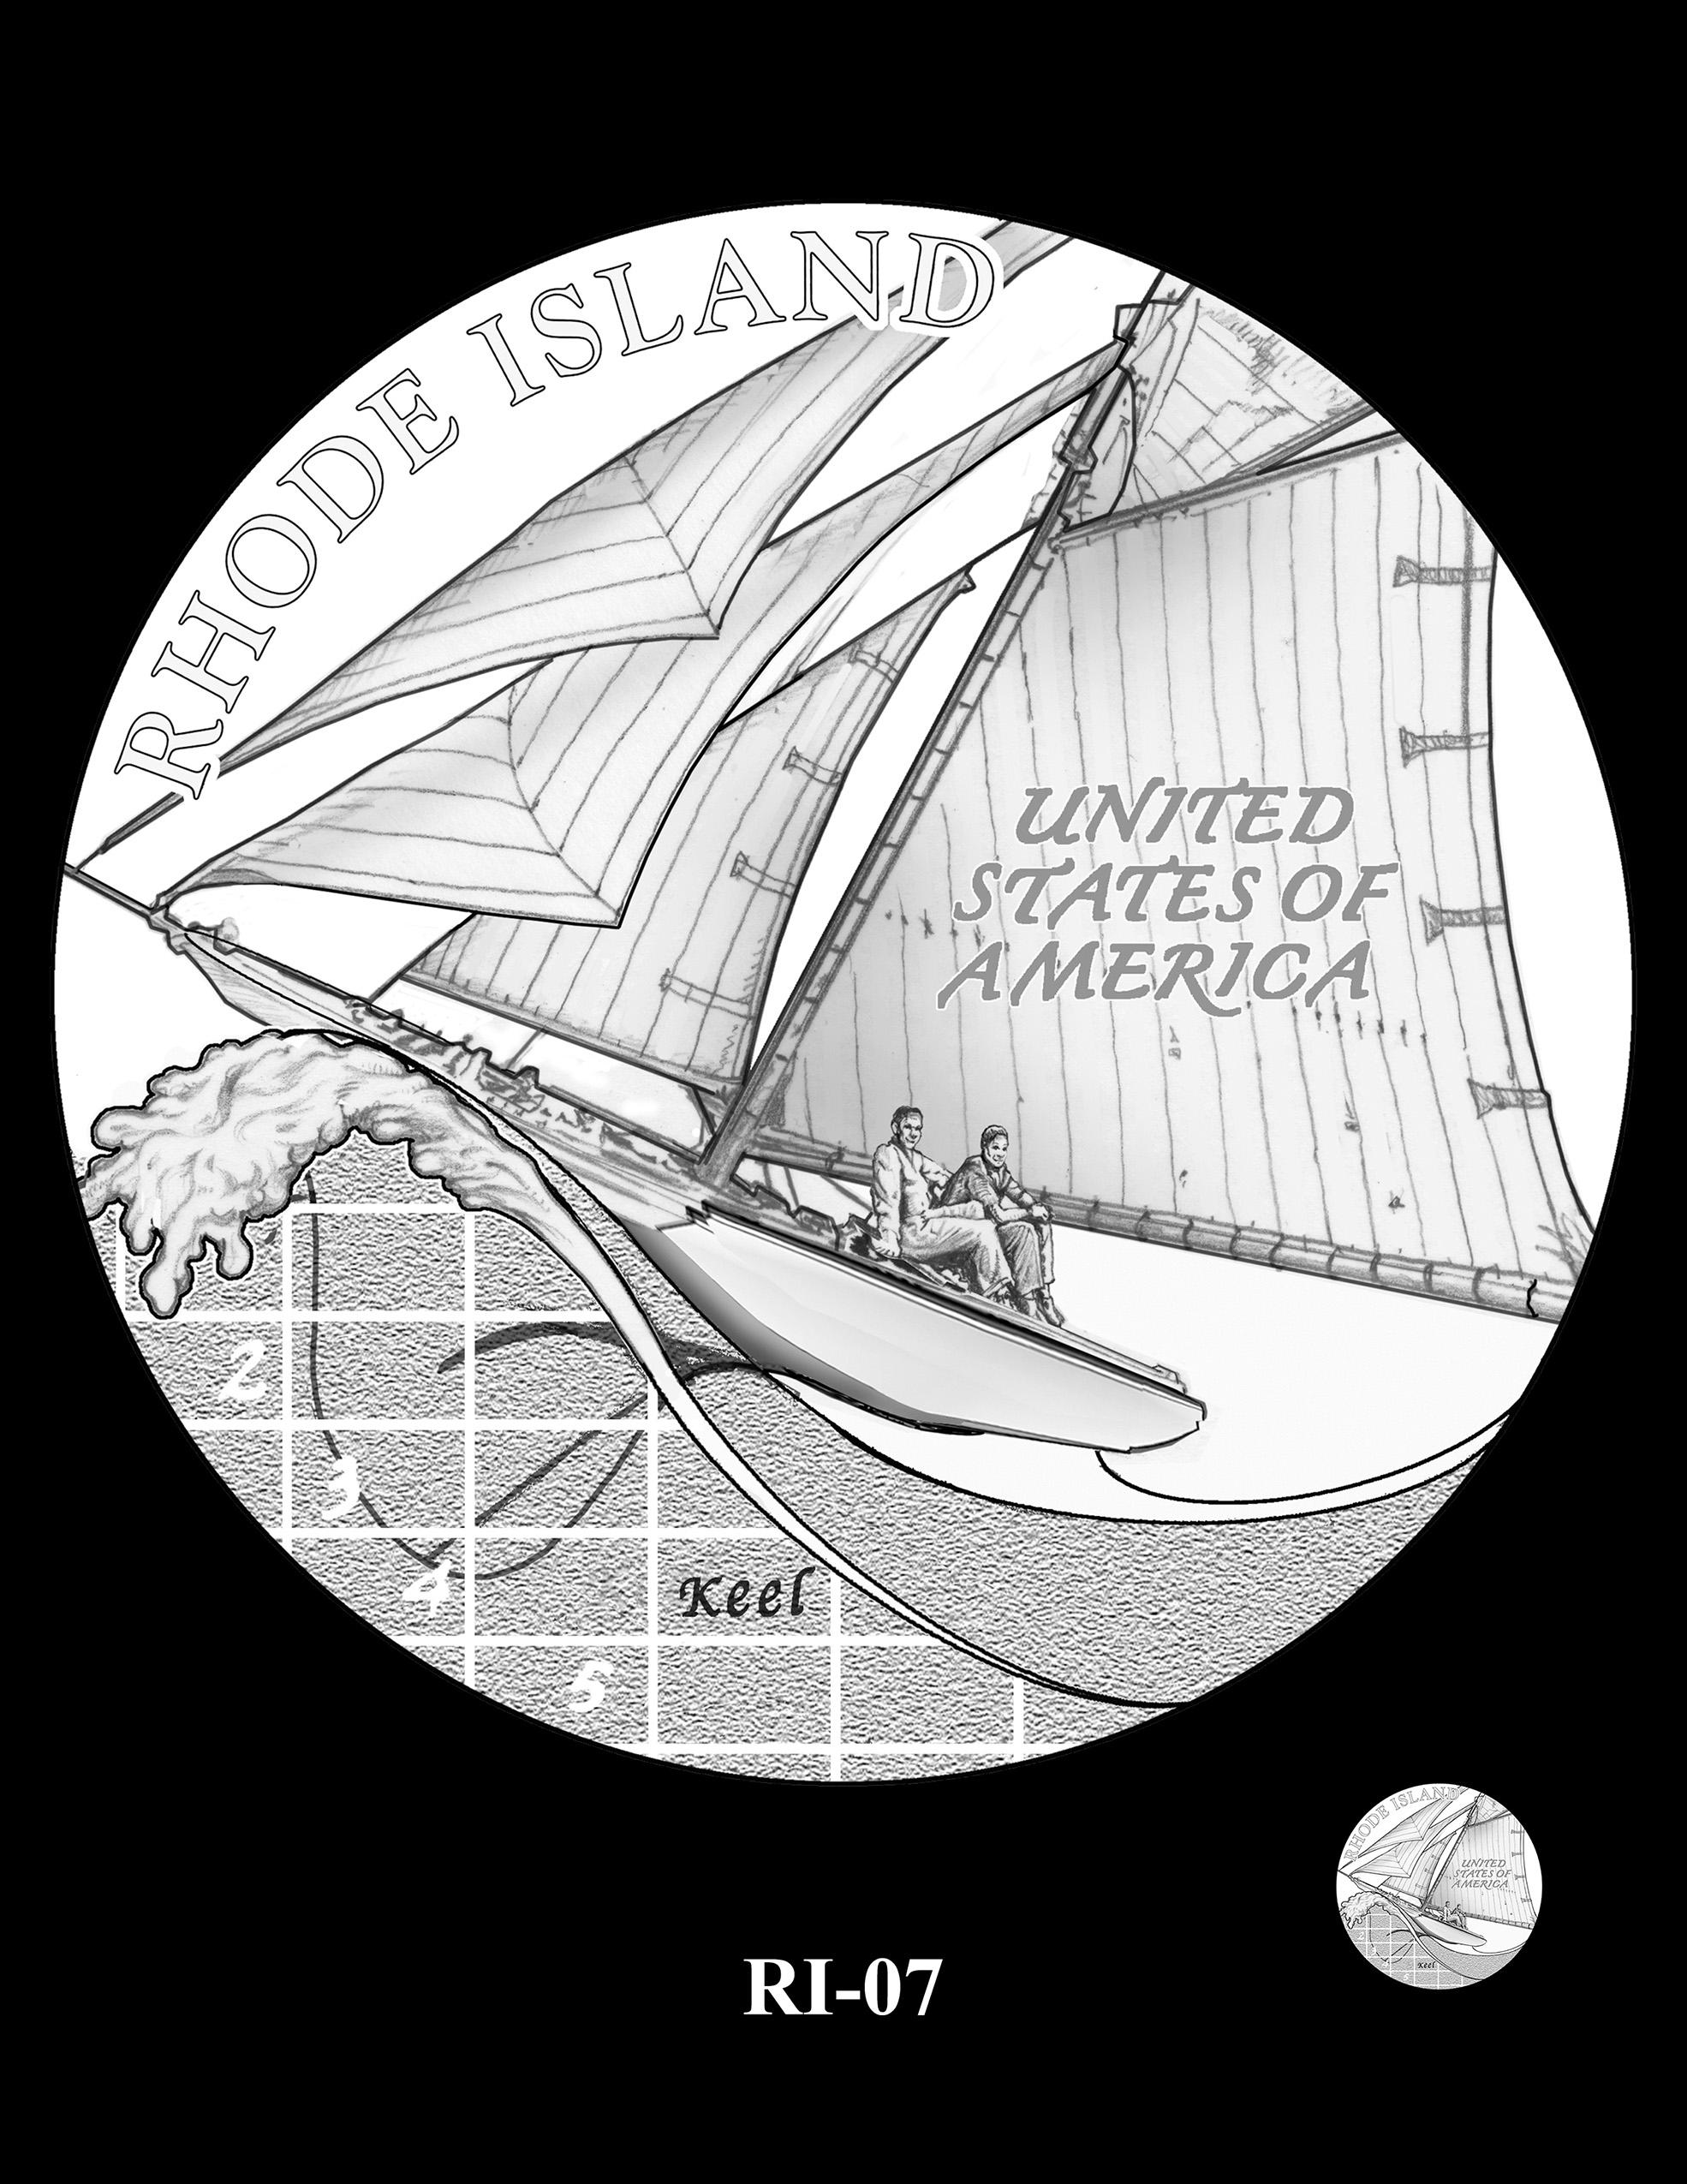 RI-07 -- 2022 American Innovation $1 Coin - Rhode Island